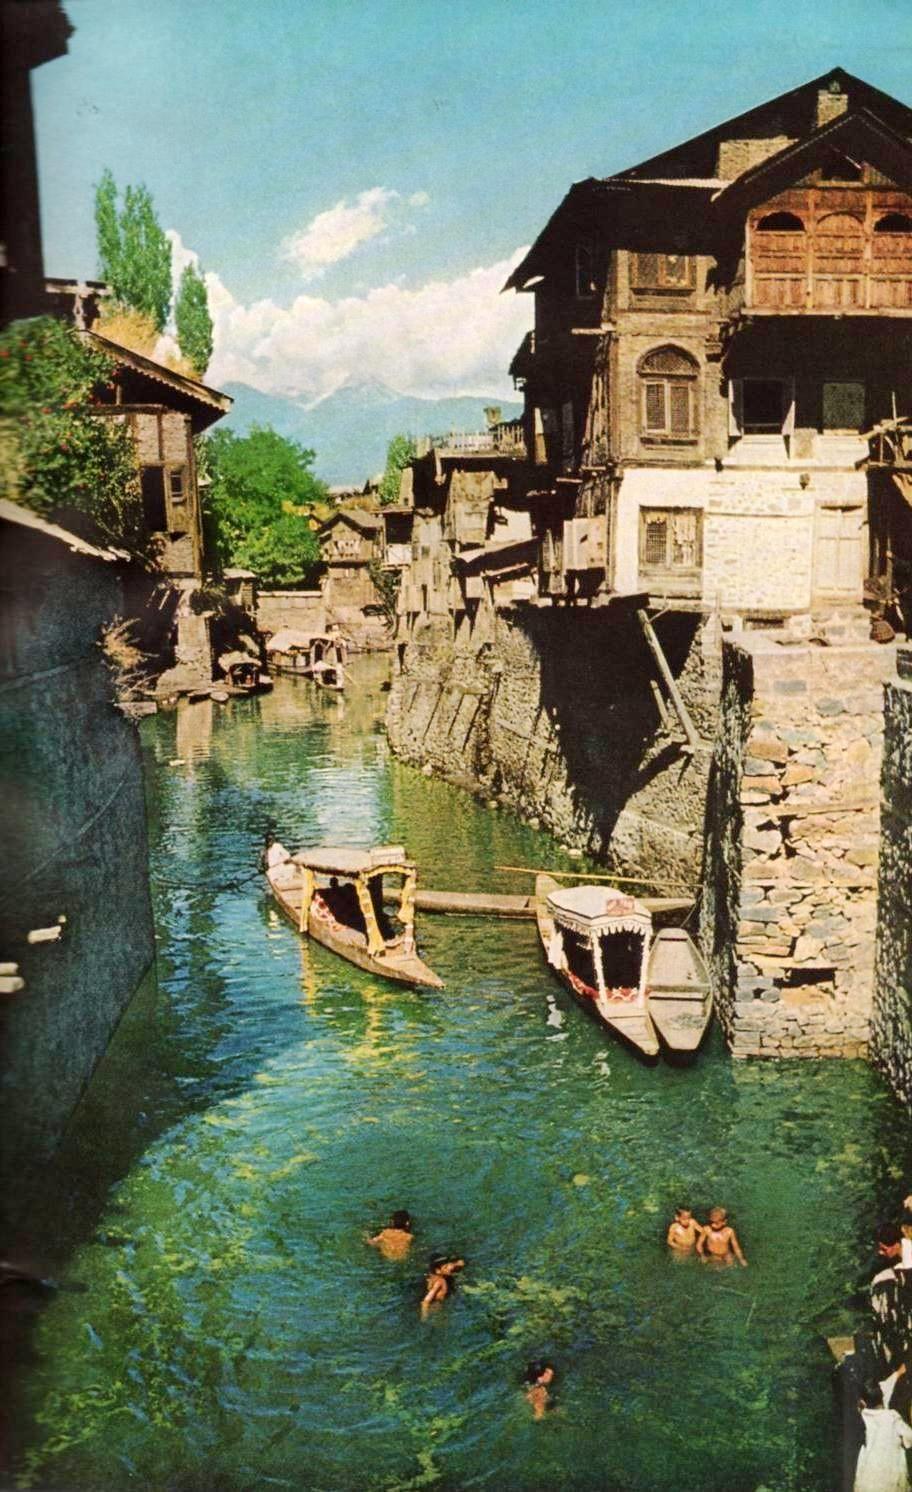 Kasheeer On Instagram Kashmir Nostalgic Photo By Kashmirdiaries Kashmir Culture Tradition Kashphotoclub Dailylifekas Nostalgic Pictures Photo Srinagar